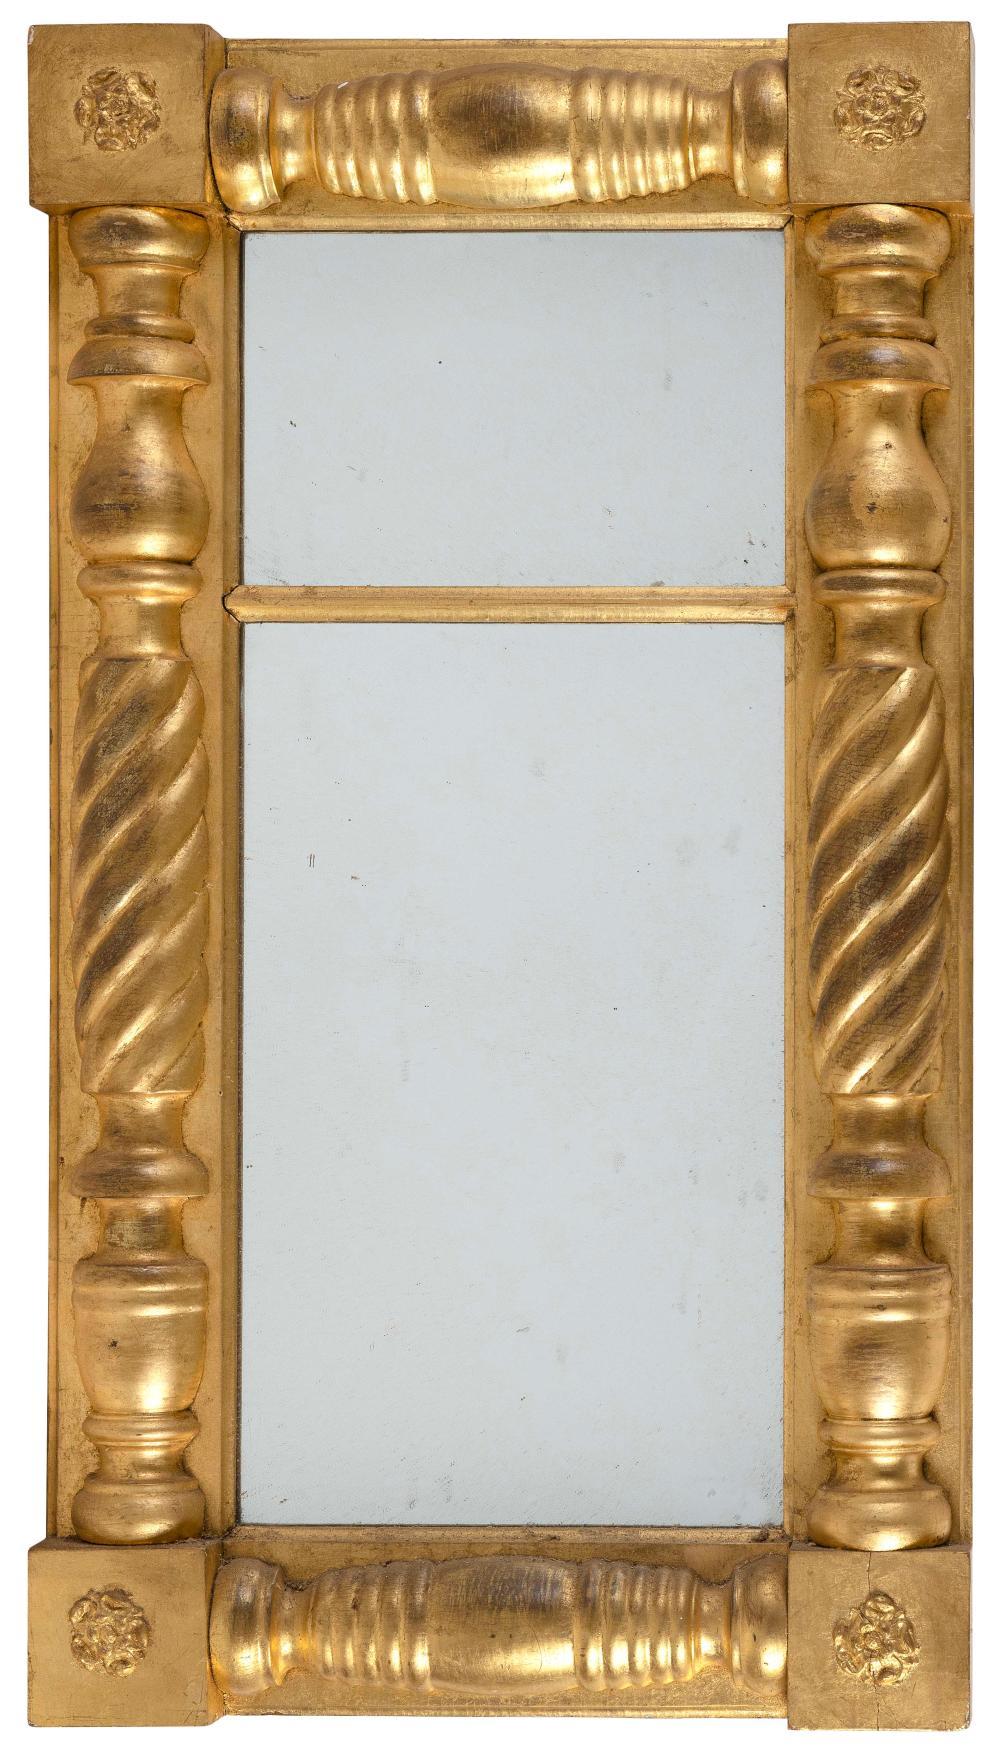 "FEDERAL HALF-COLUMN MIRROR America, Circa 1825 Height 36"". Width 20""."